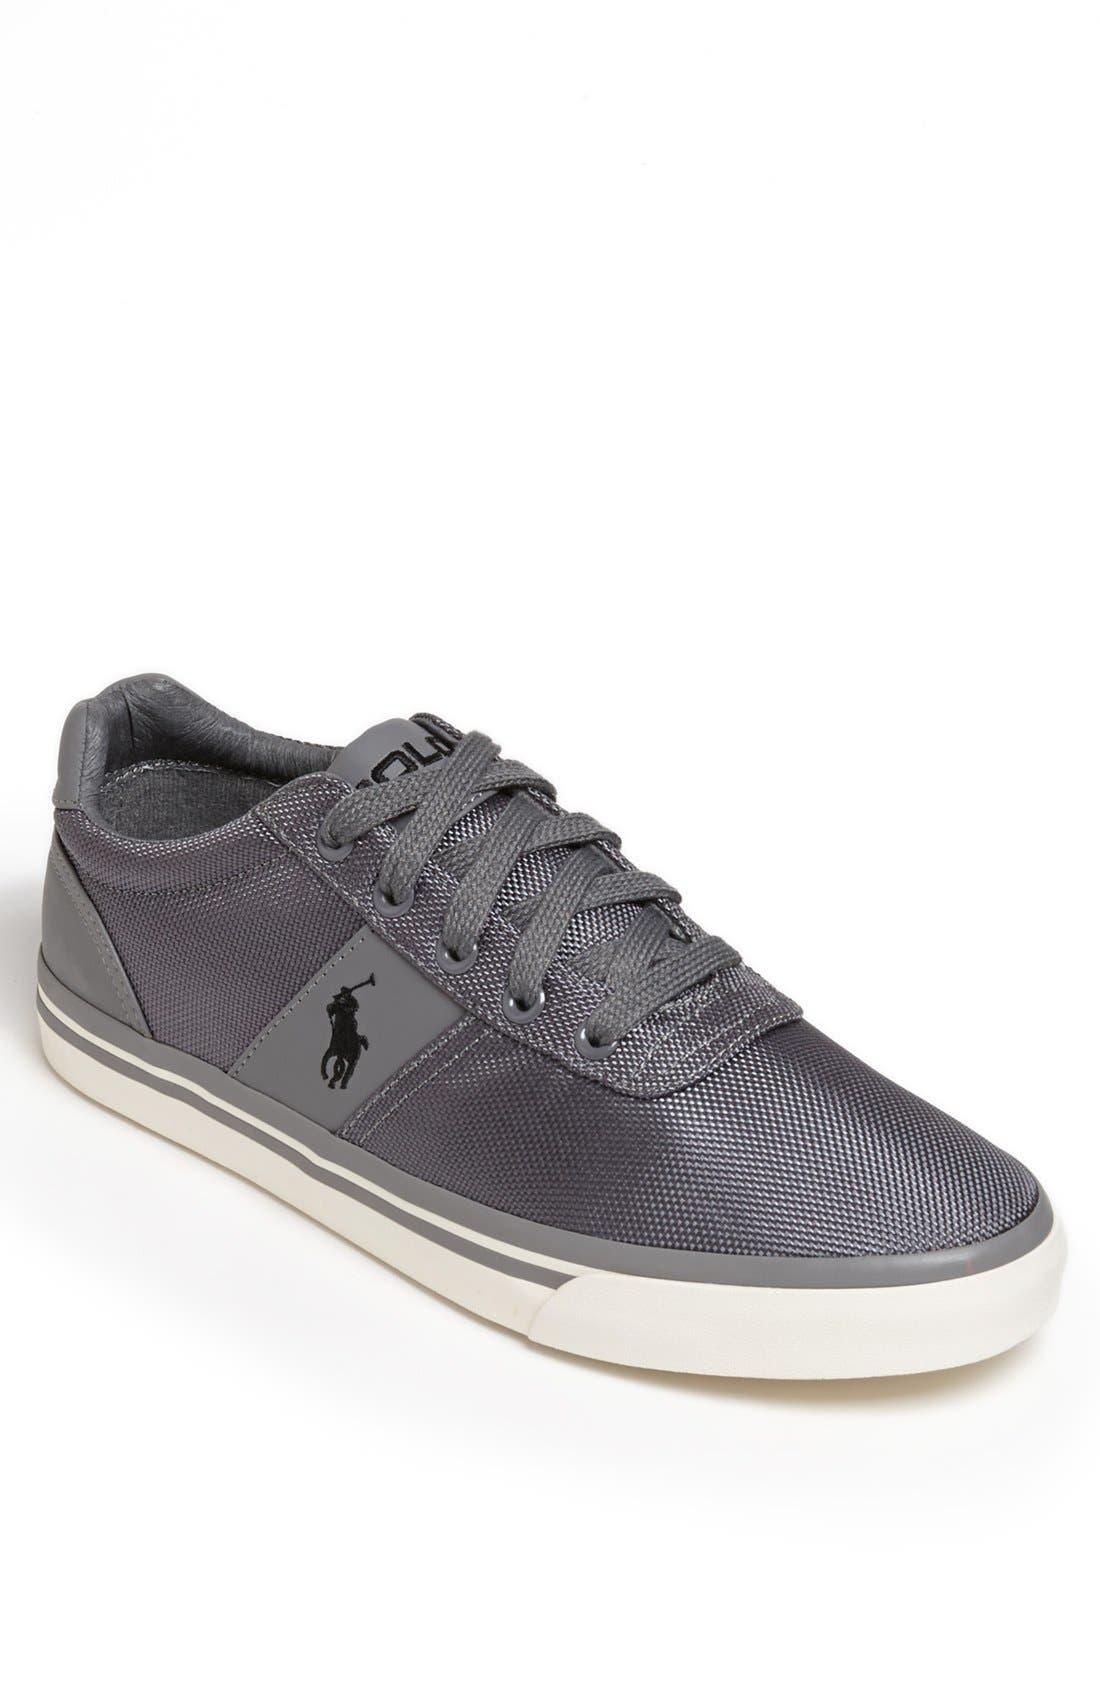 Main Image - Polo Ralph Lauren 'Hanford' Sneaker (Men)